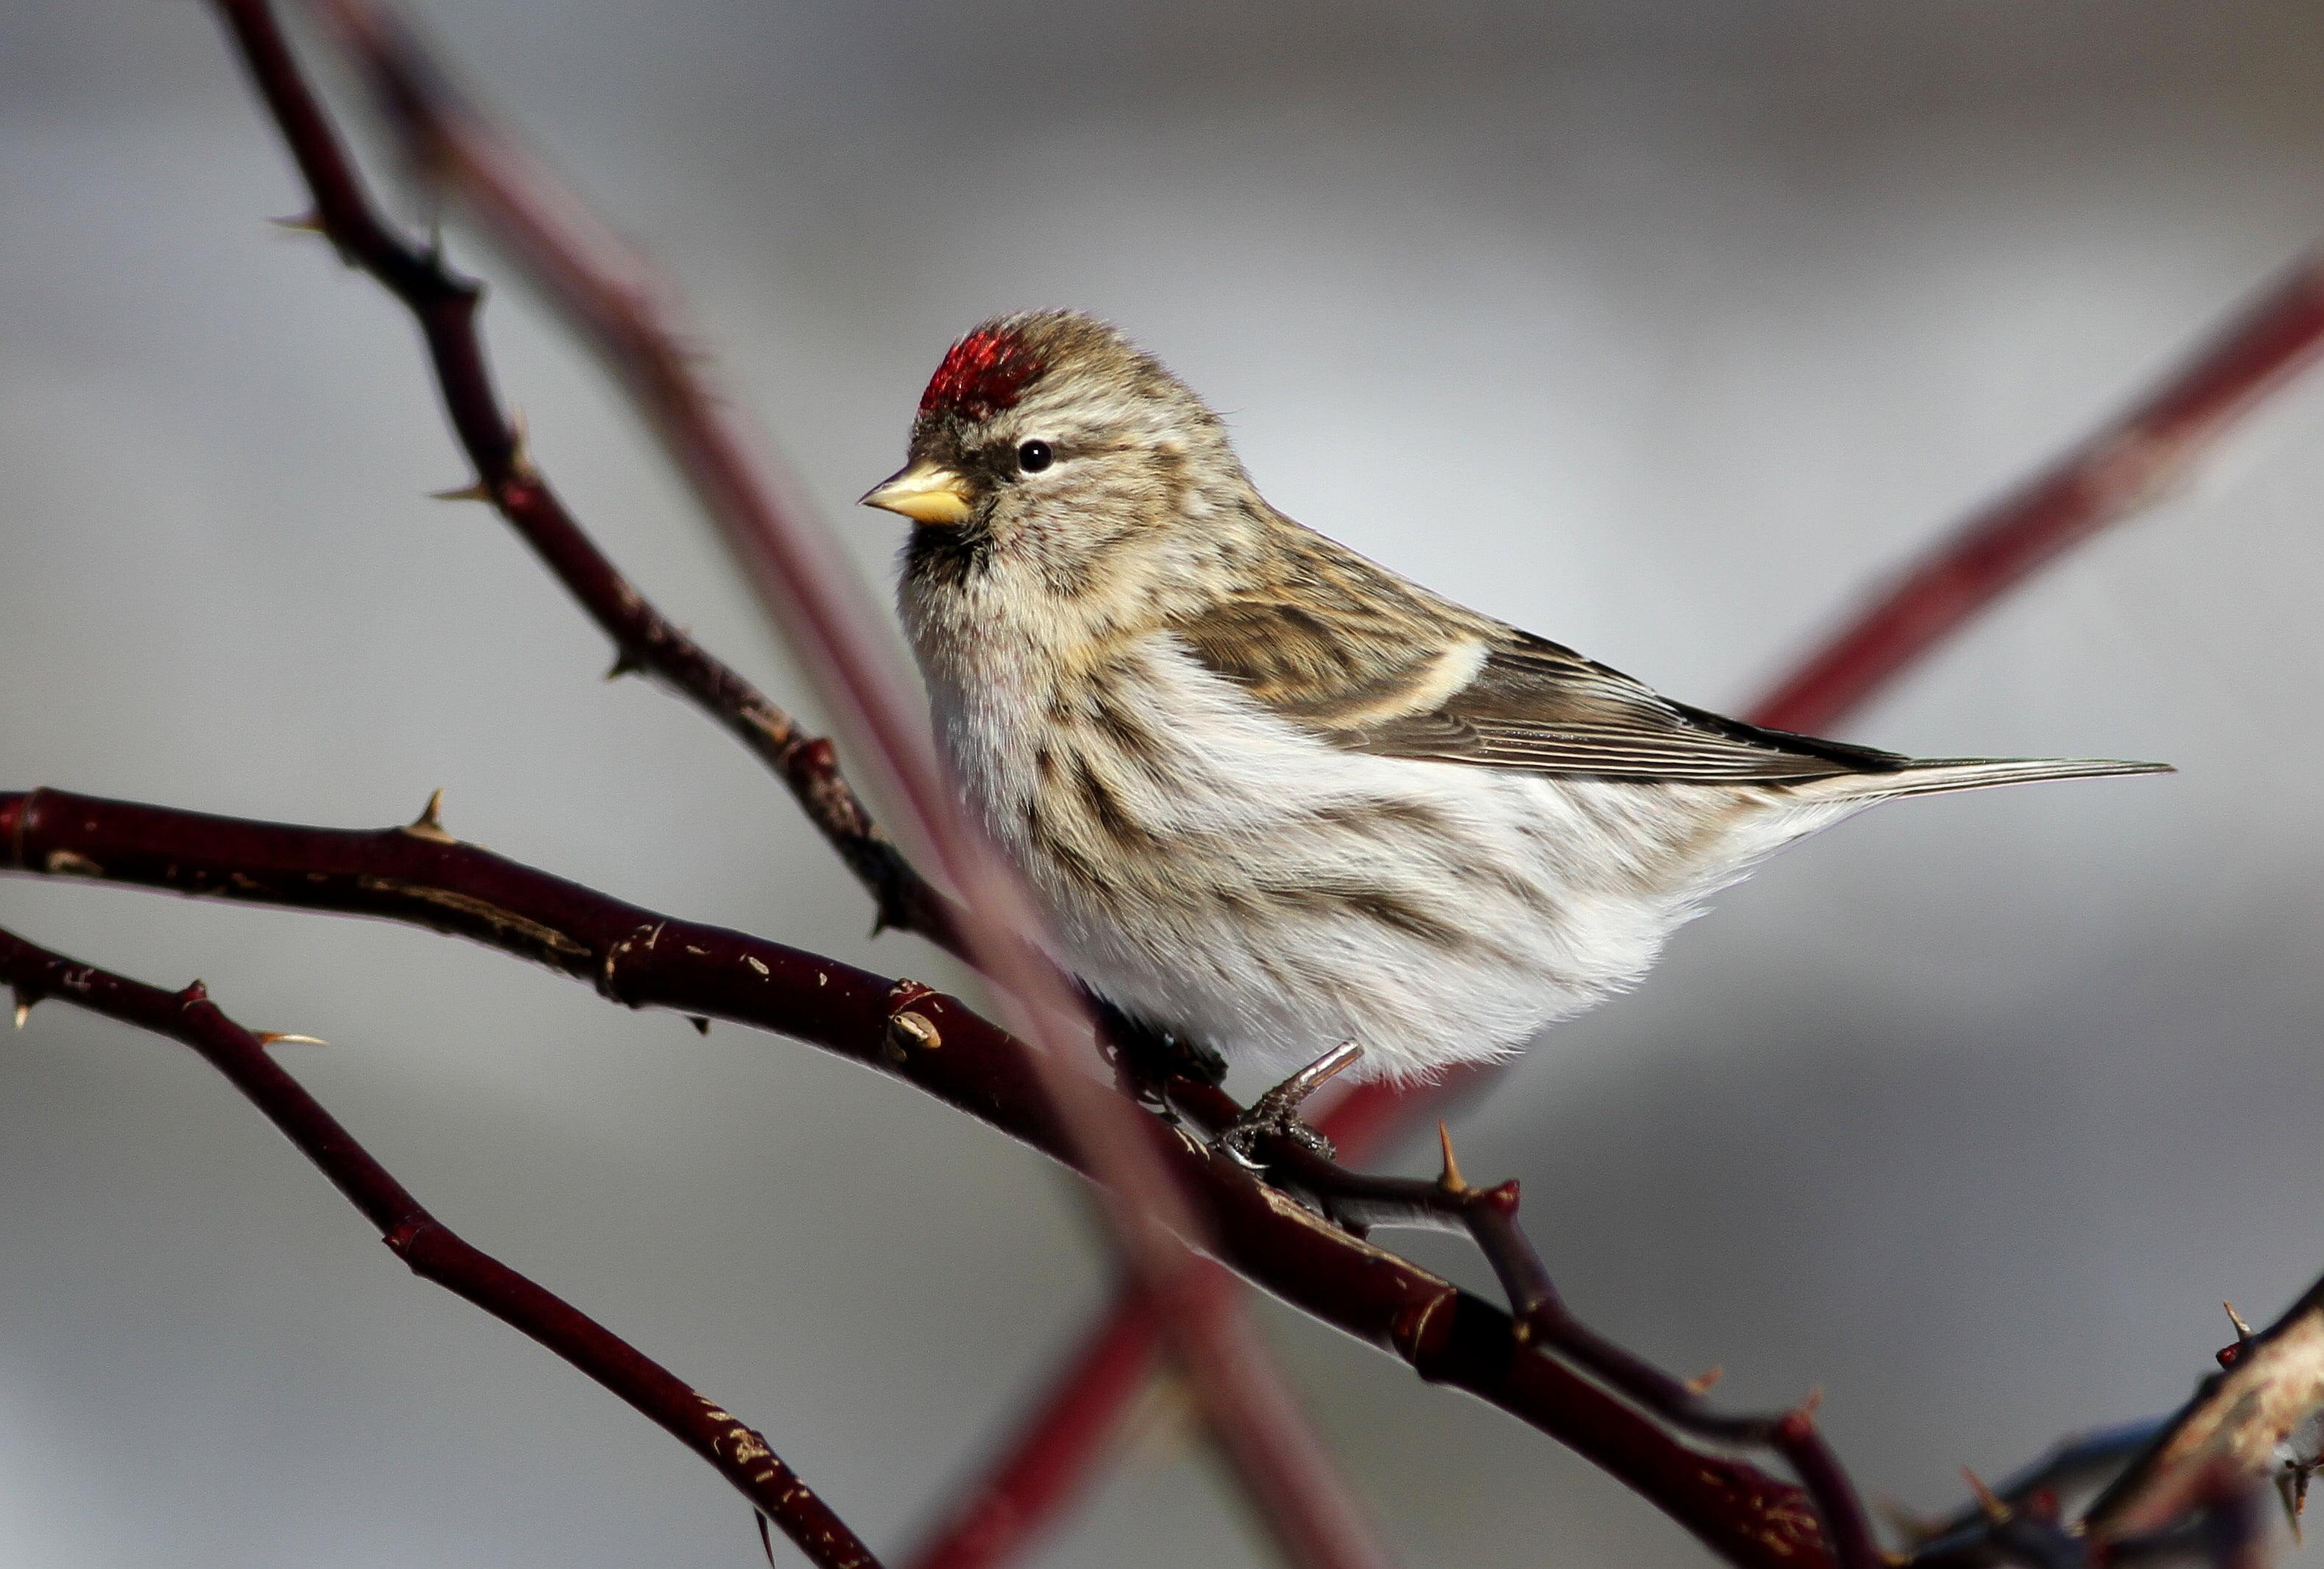 Brown bird on tree branch common redpoll HD wallpaper Wallpaper 3156x2131